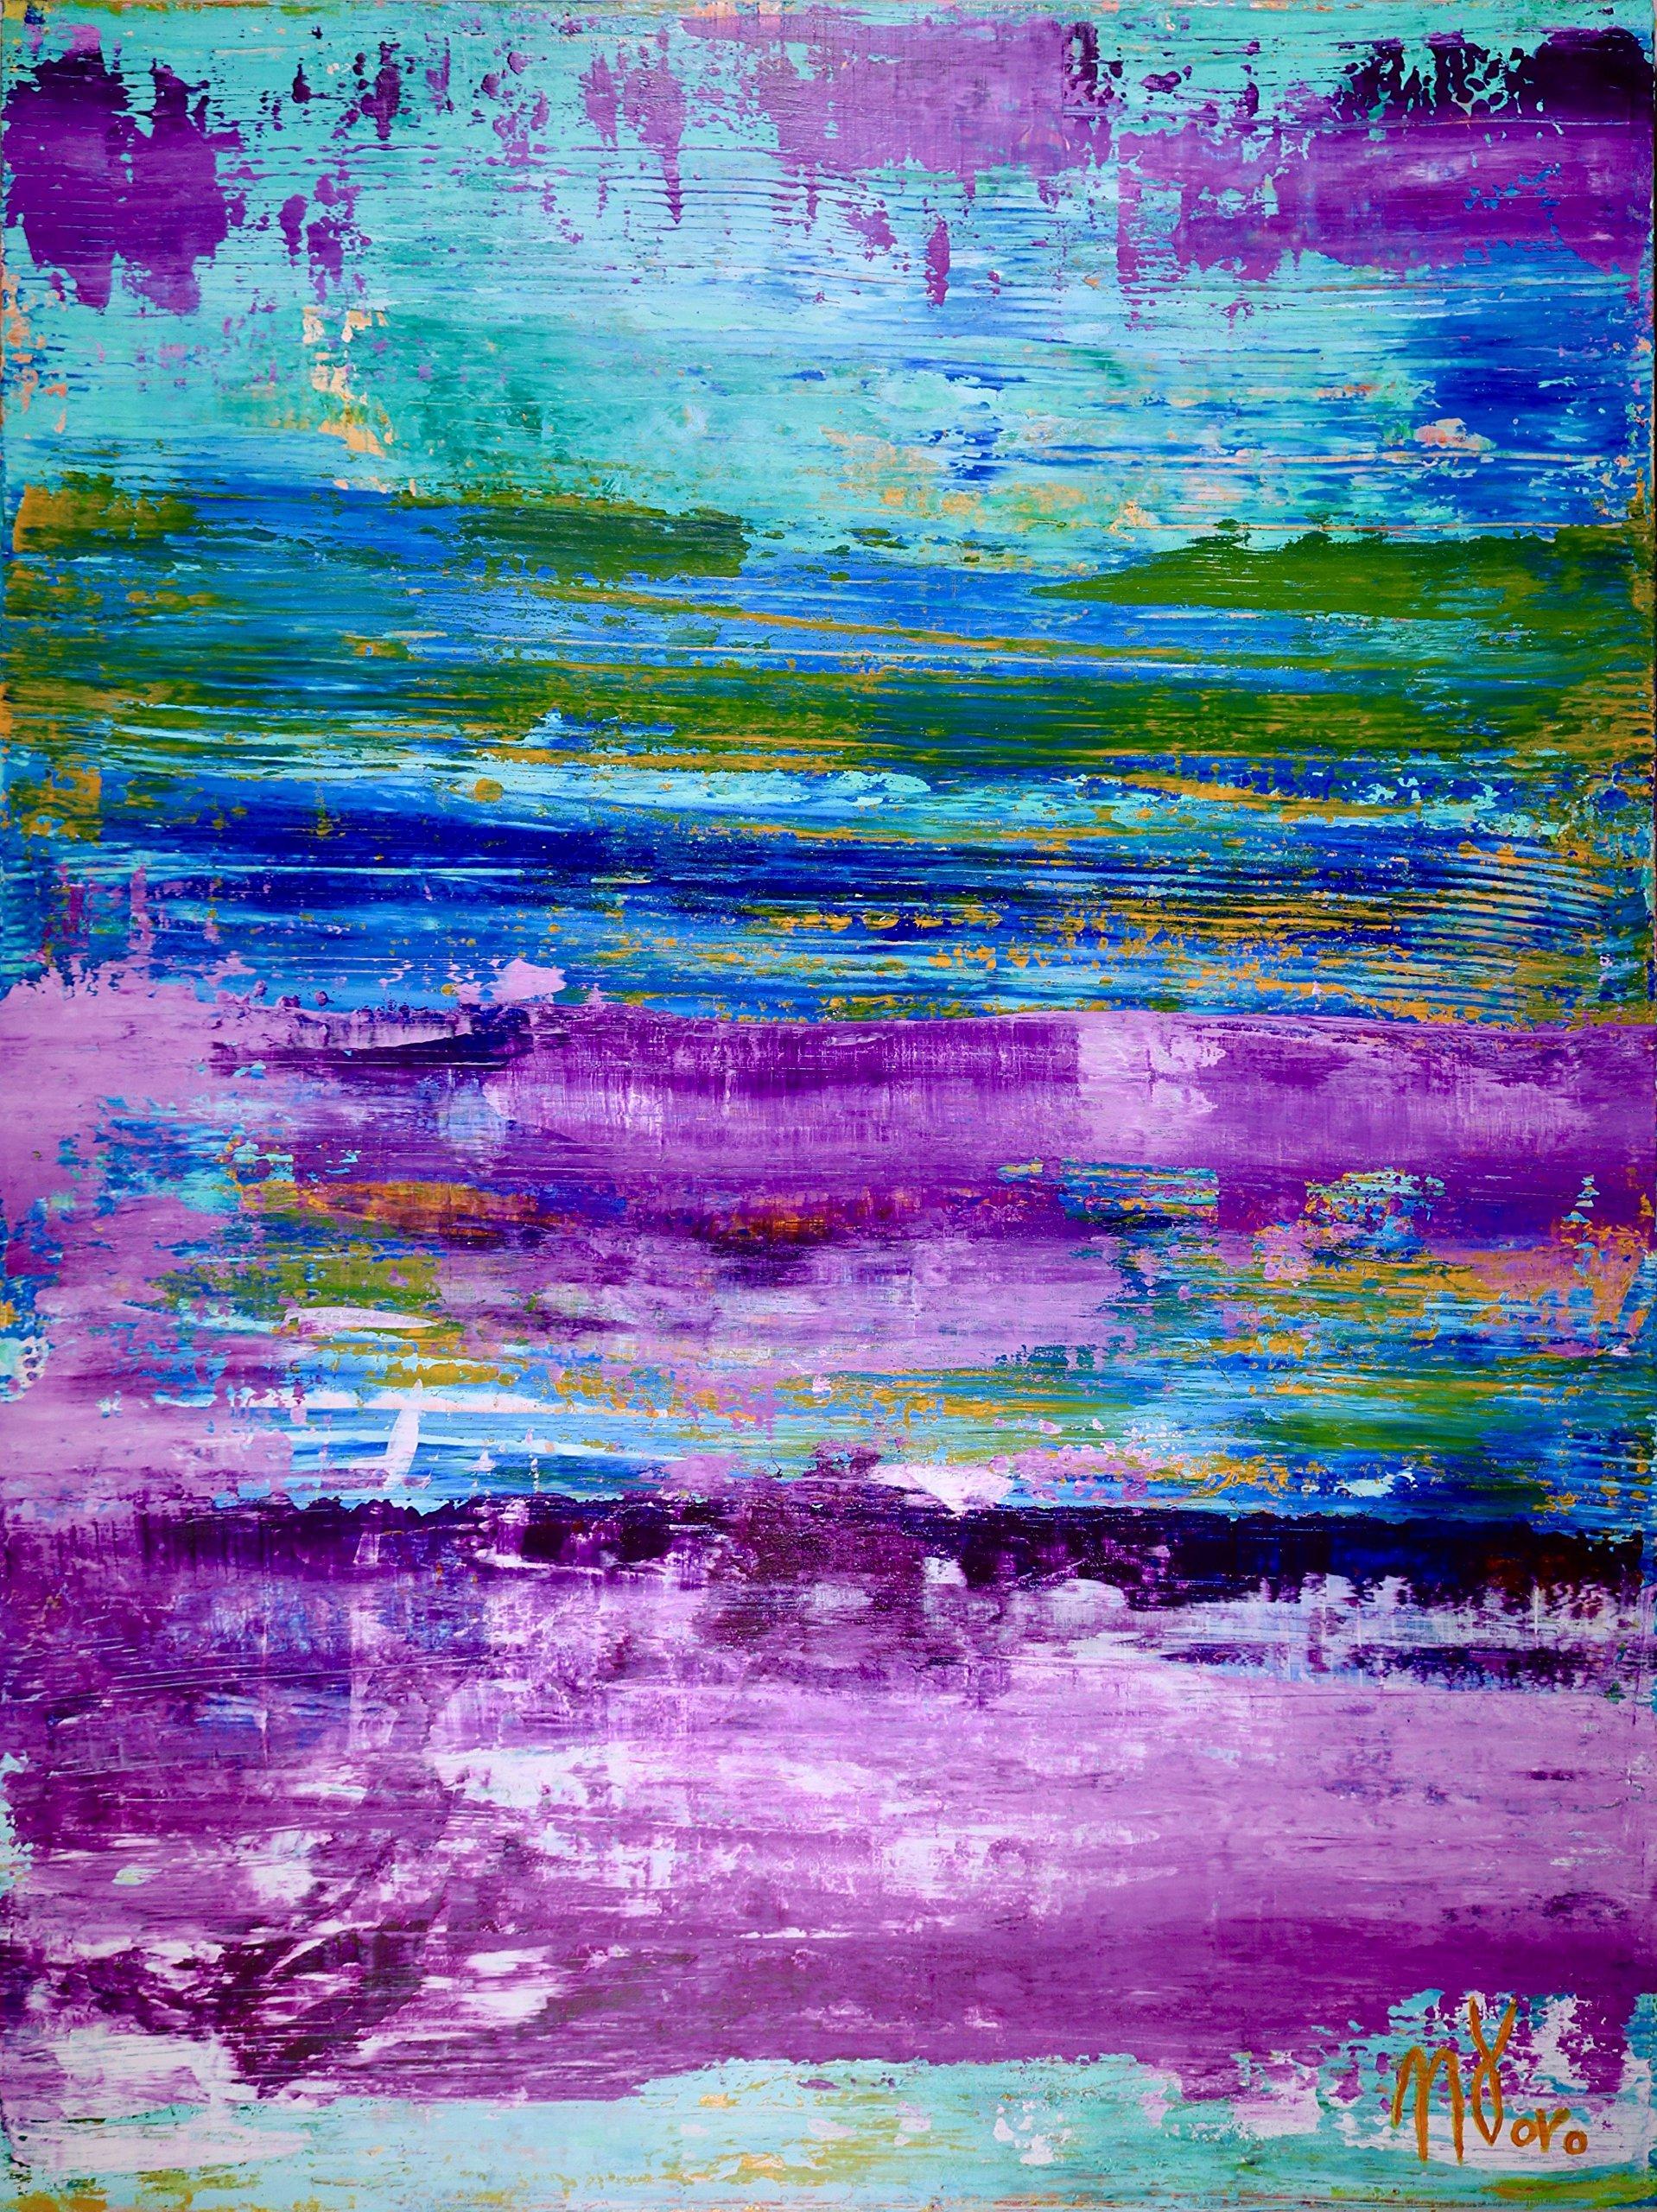 Frozen Turquoise (Purple Colorfield) (2016)